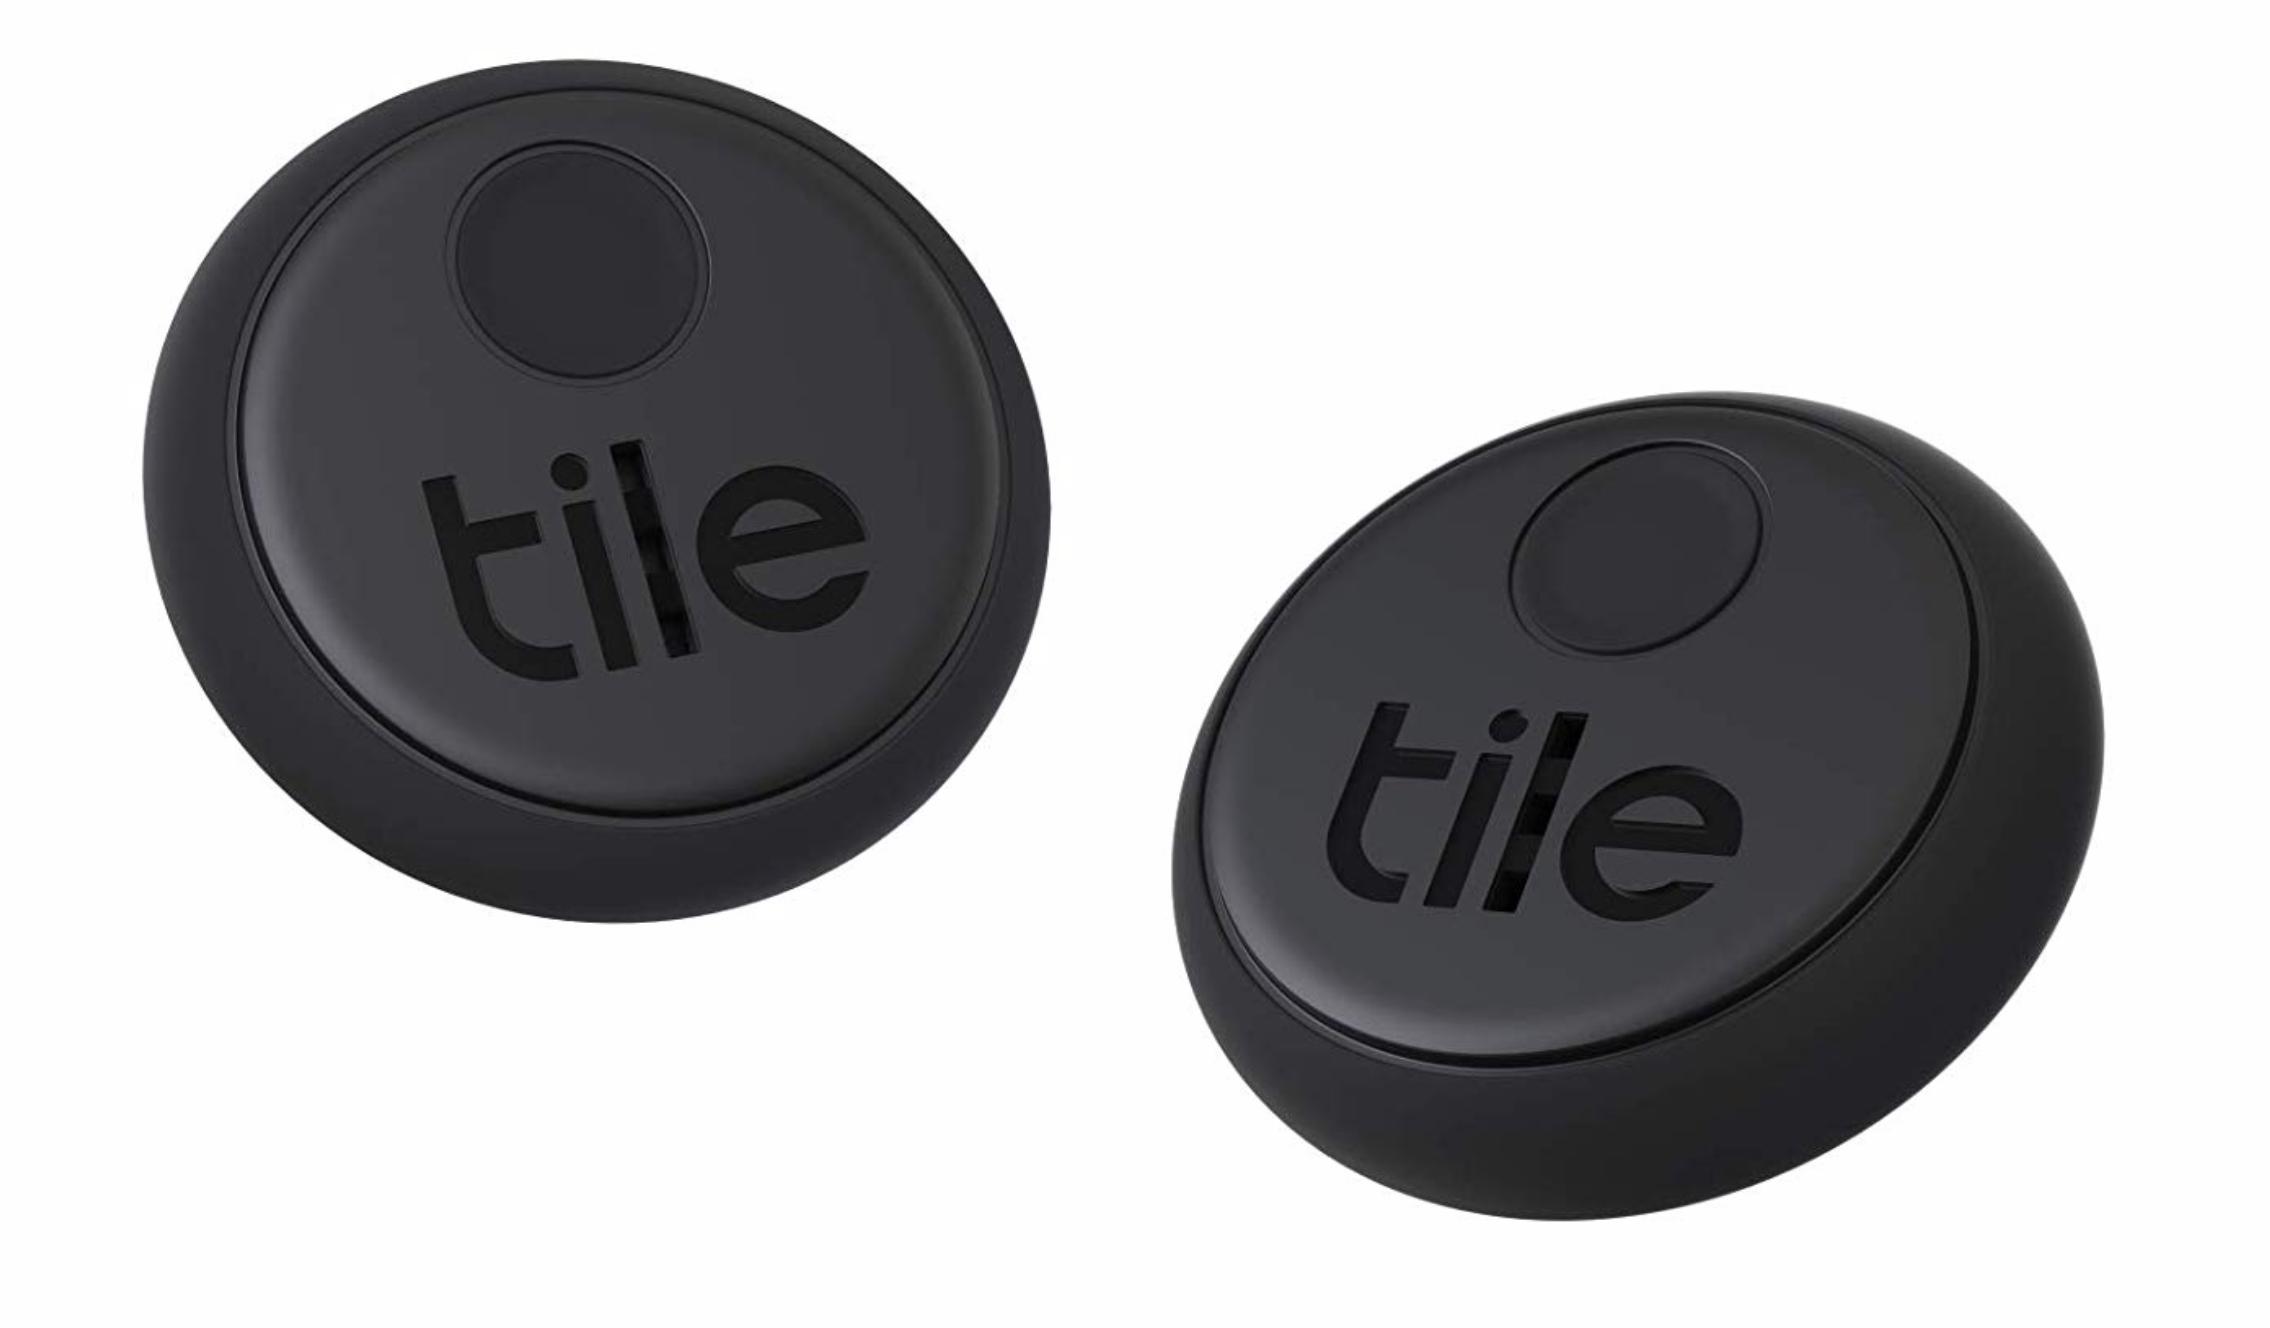 Tile Sticker (2020) 2個パック 探し物/スマホが見つかる 紛失防止 日米シ